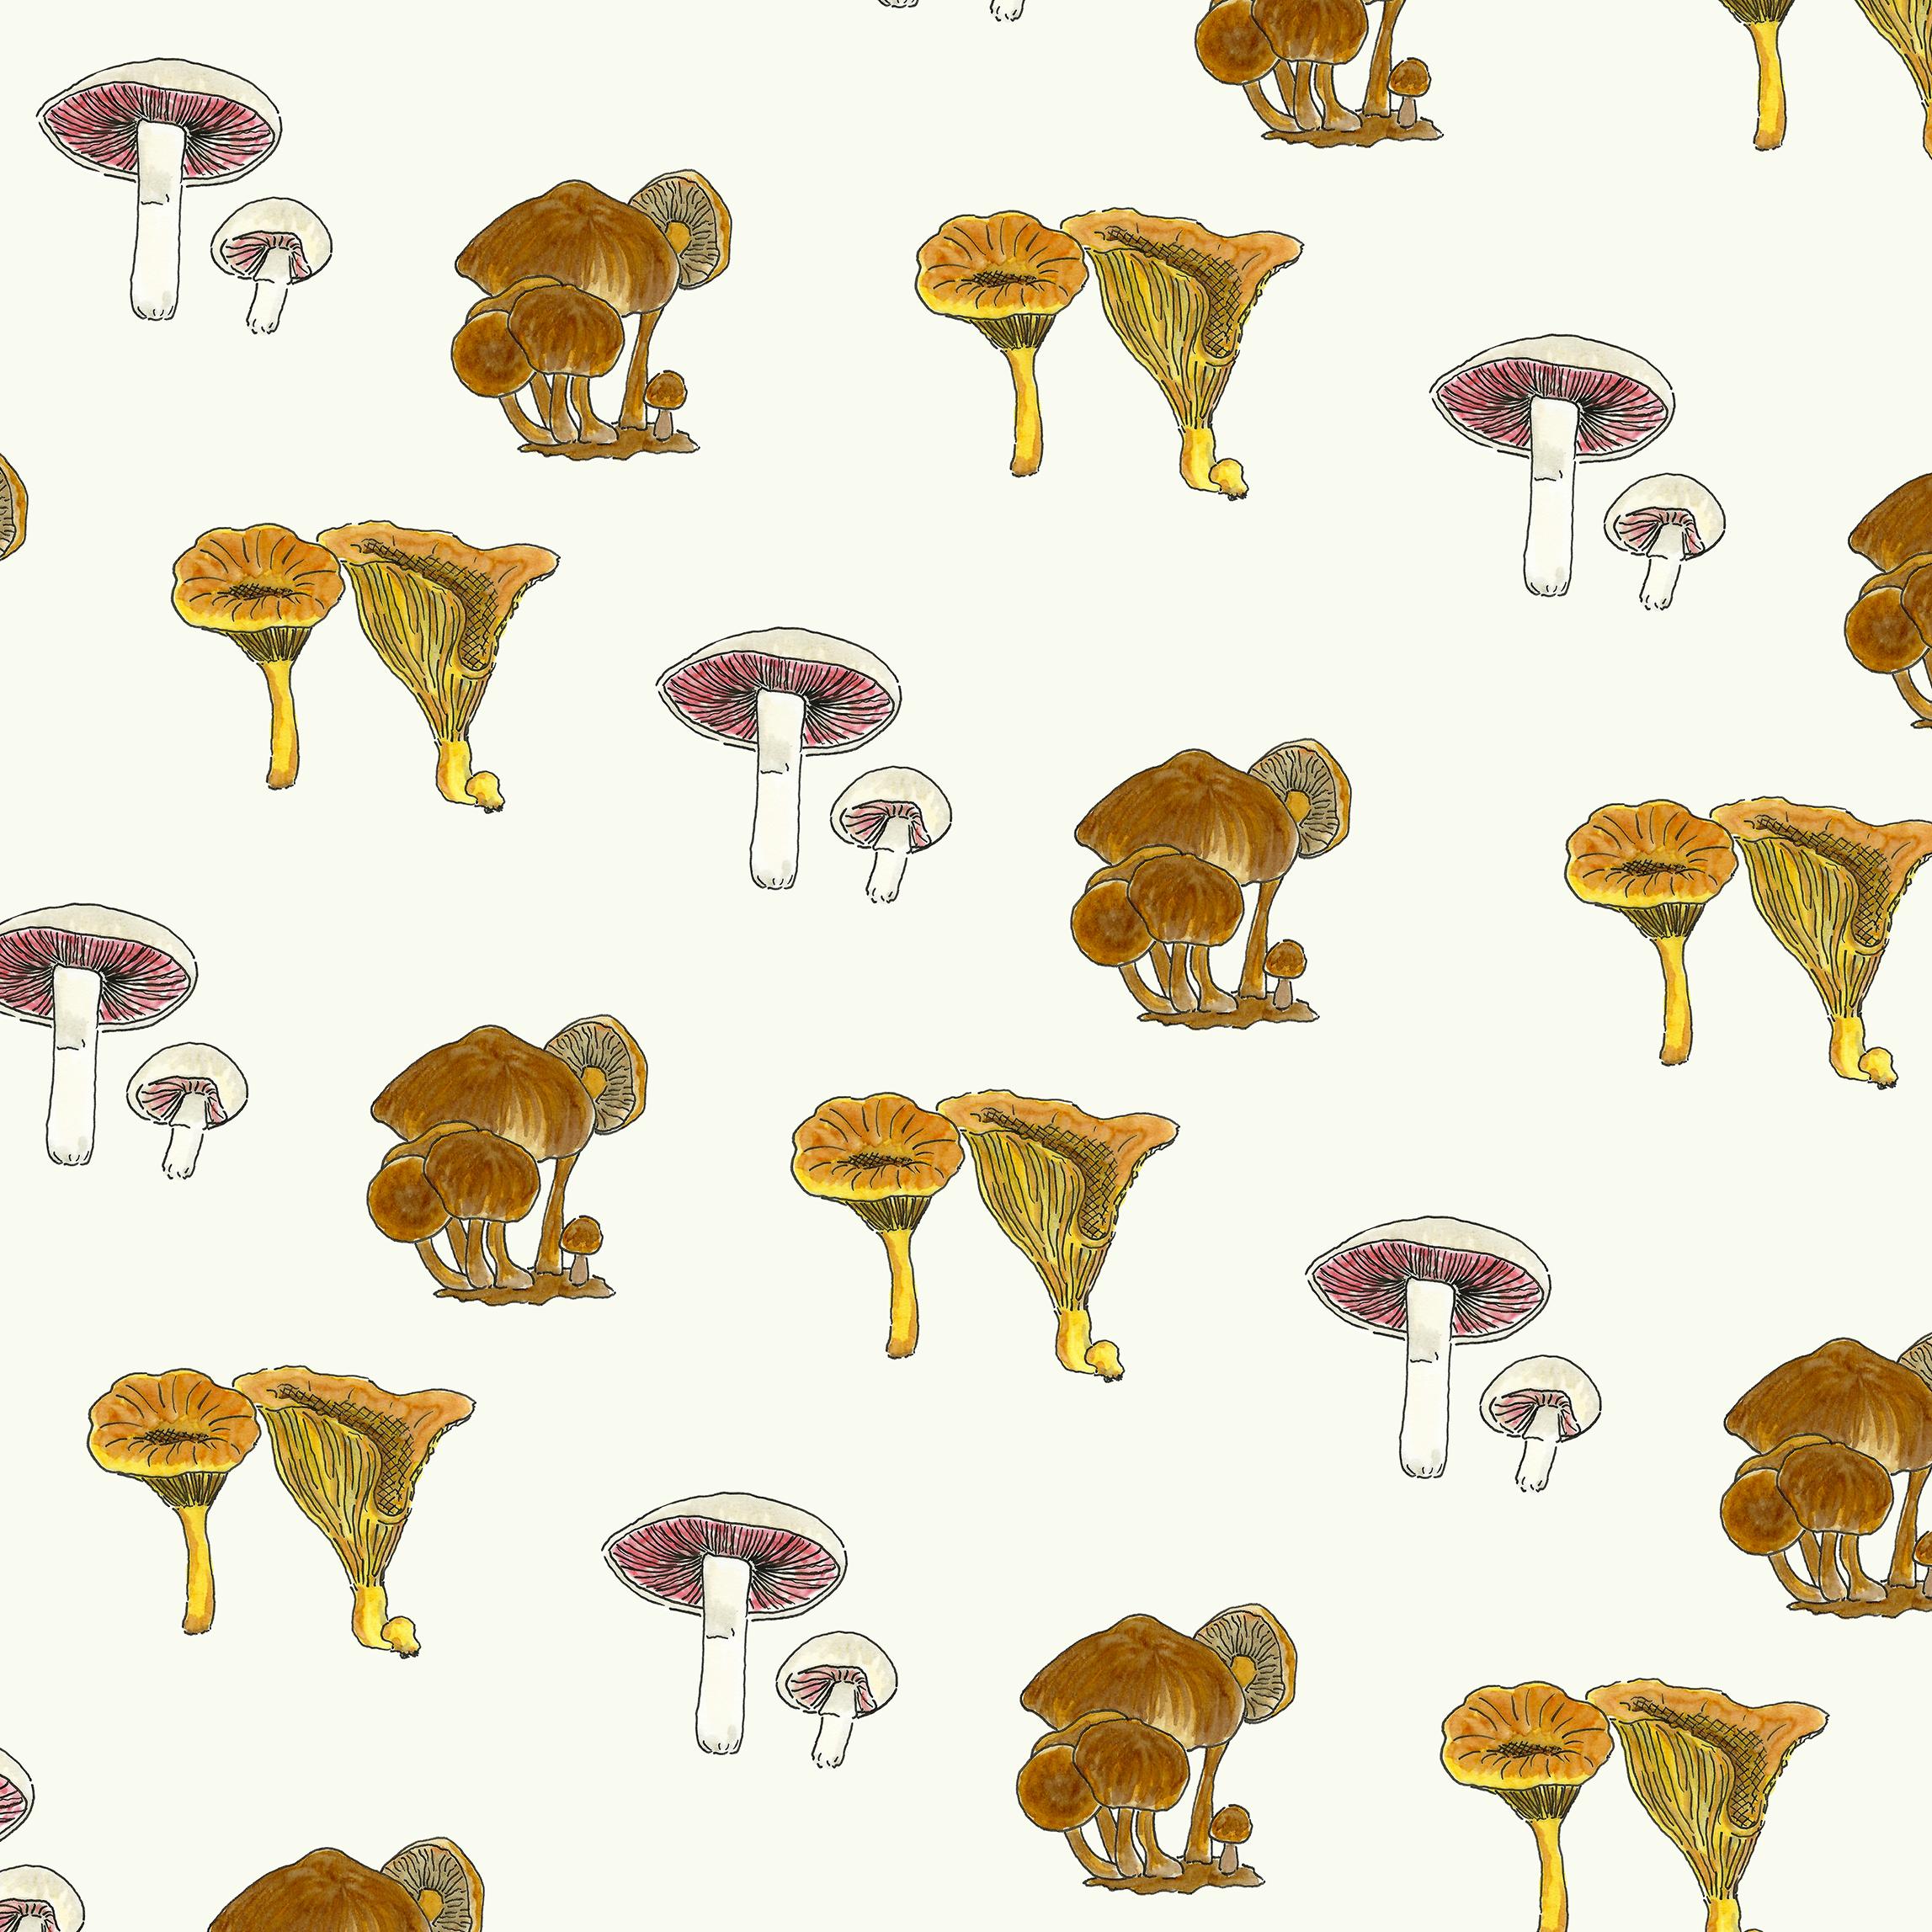 Edible Mushrooms by Kate Zaremba